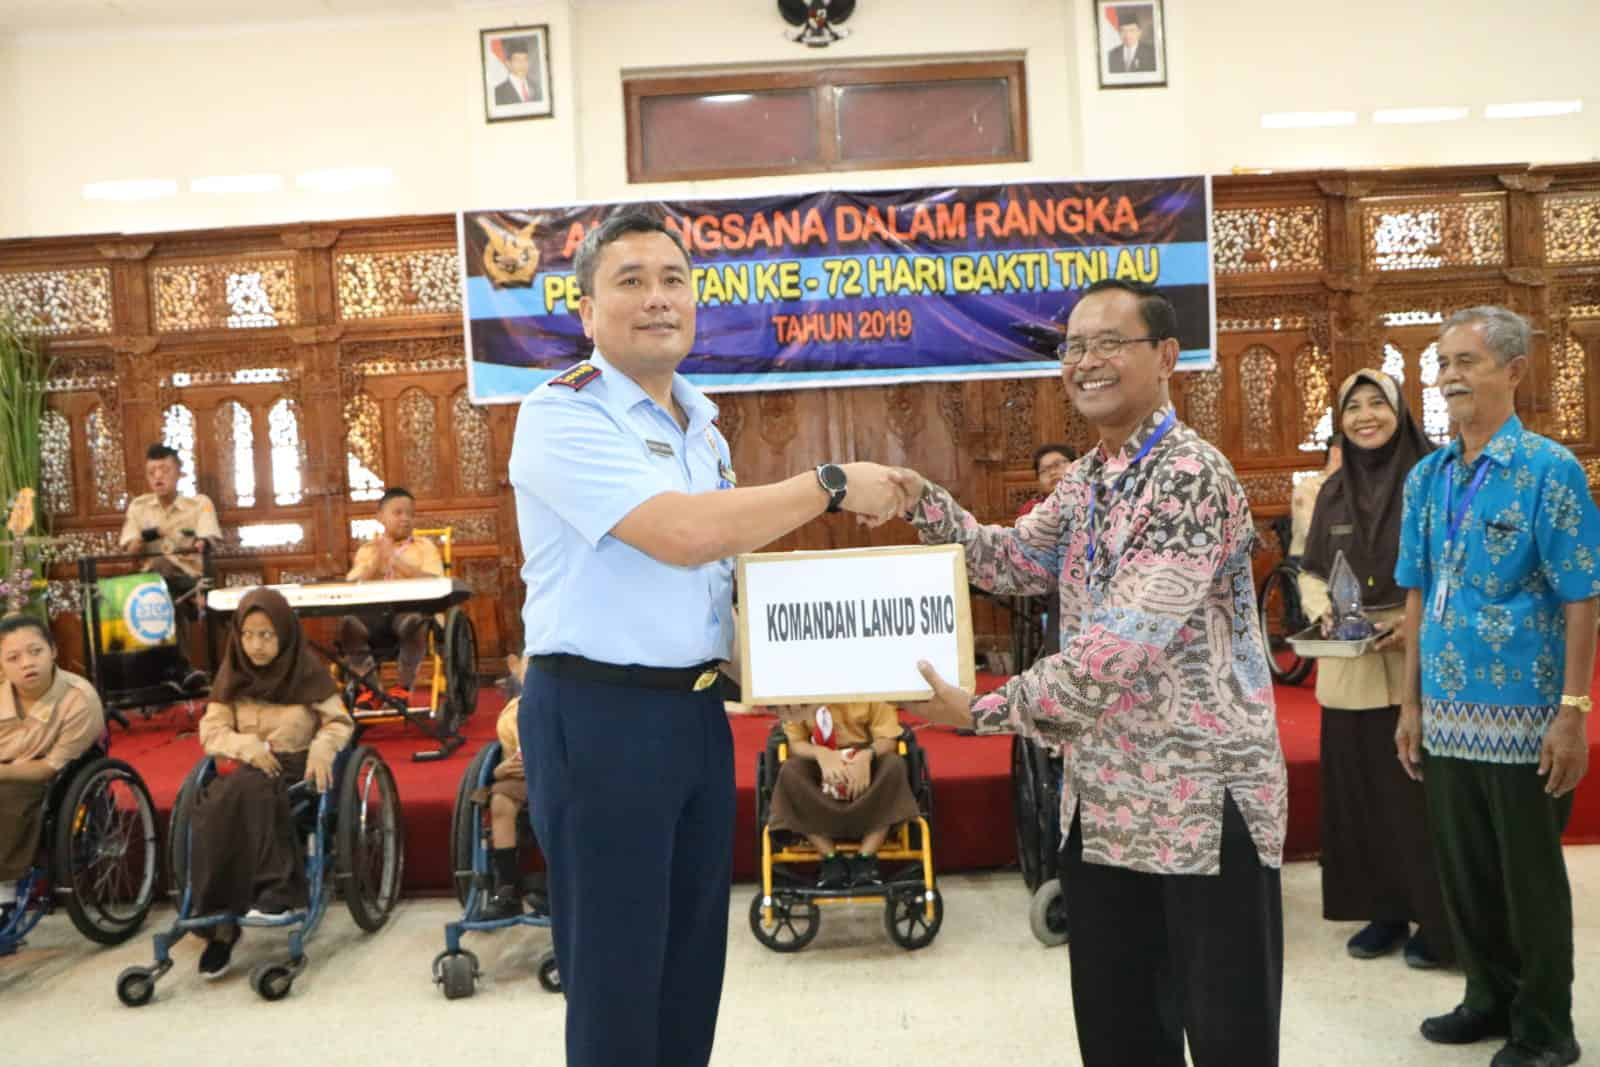 Peringati Ke 72 Hari Bakti Tni Au, Lanud Adi Soemarmo Anjangsana Ke Ypac Surakarta